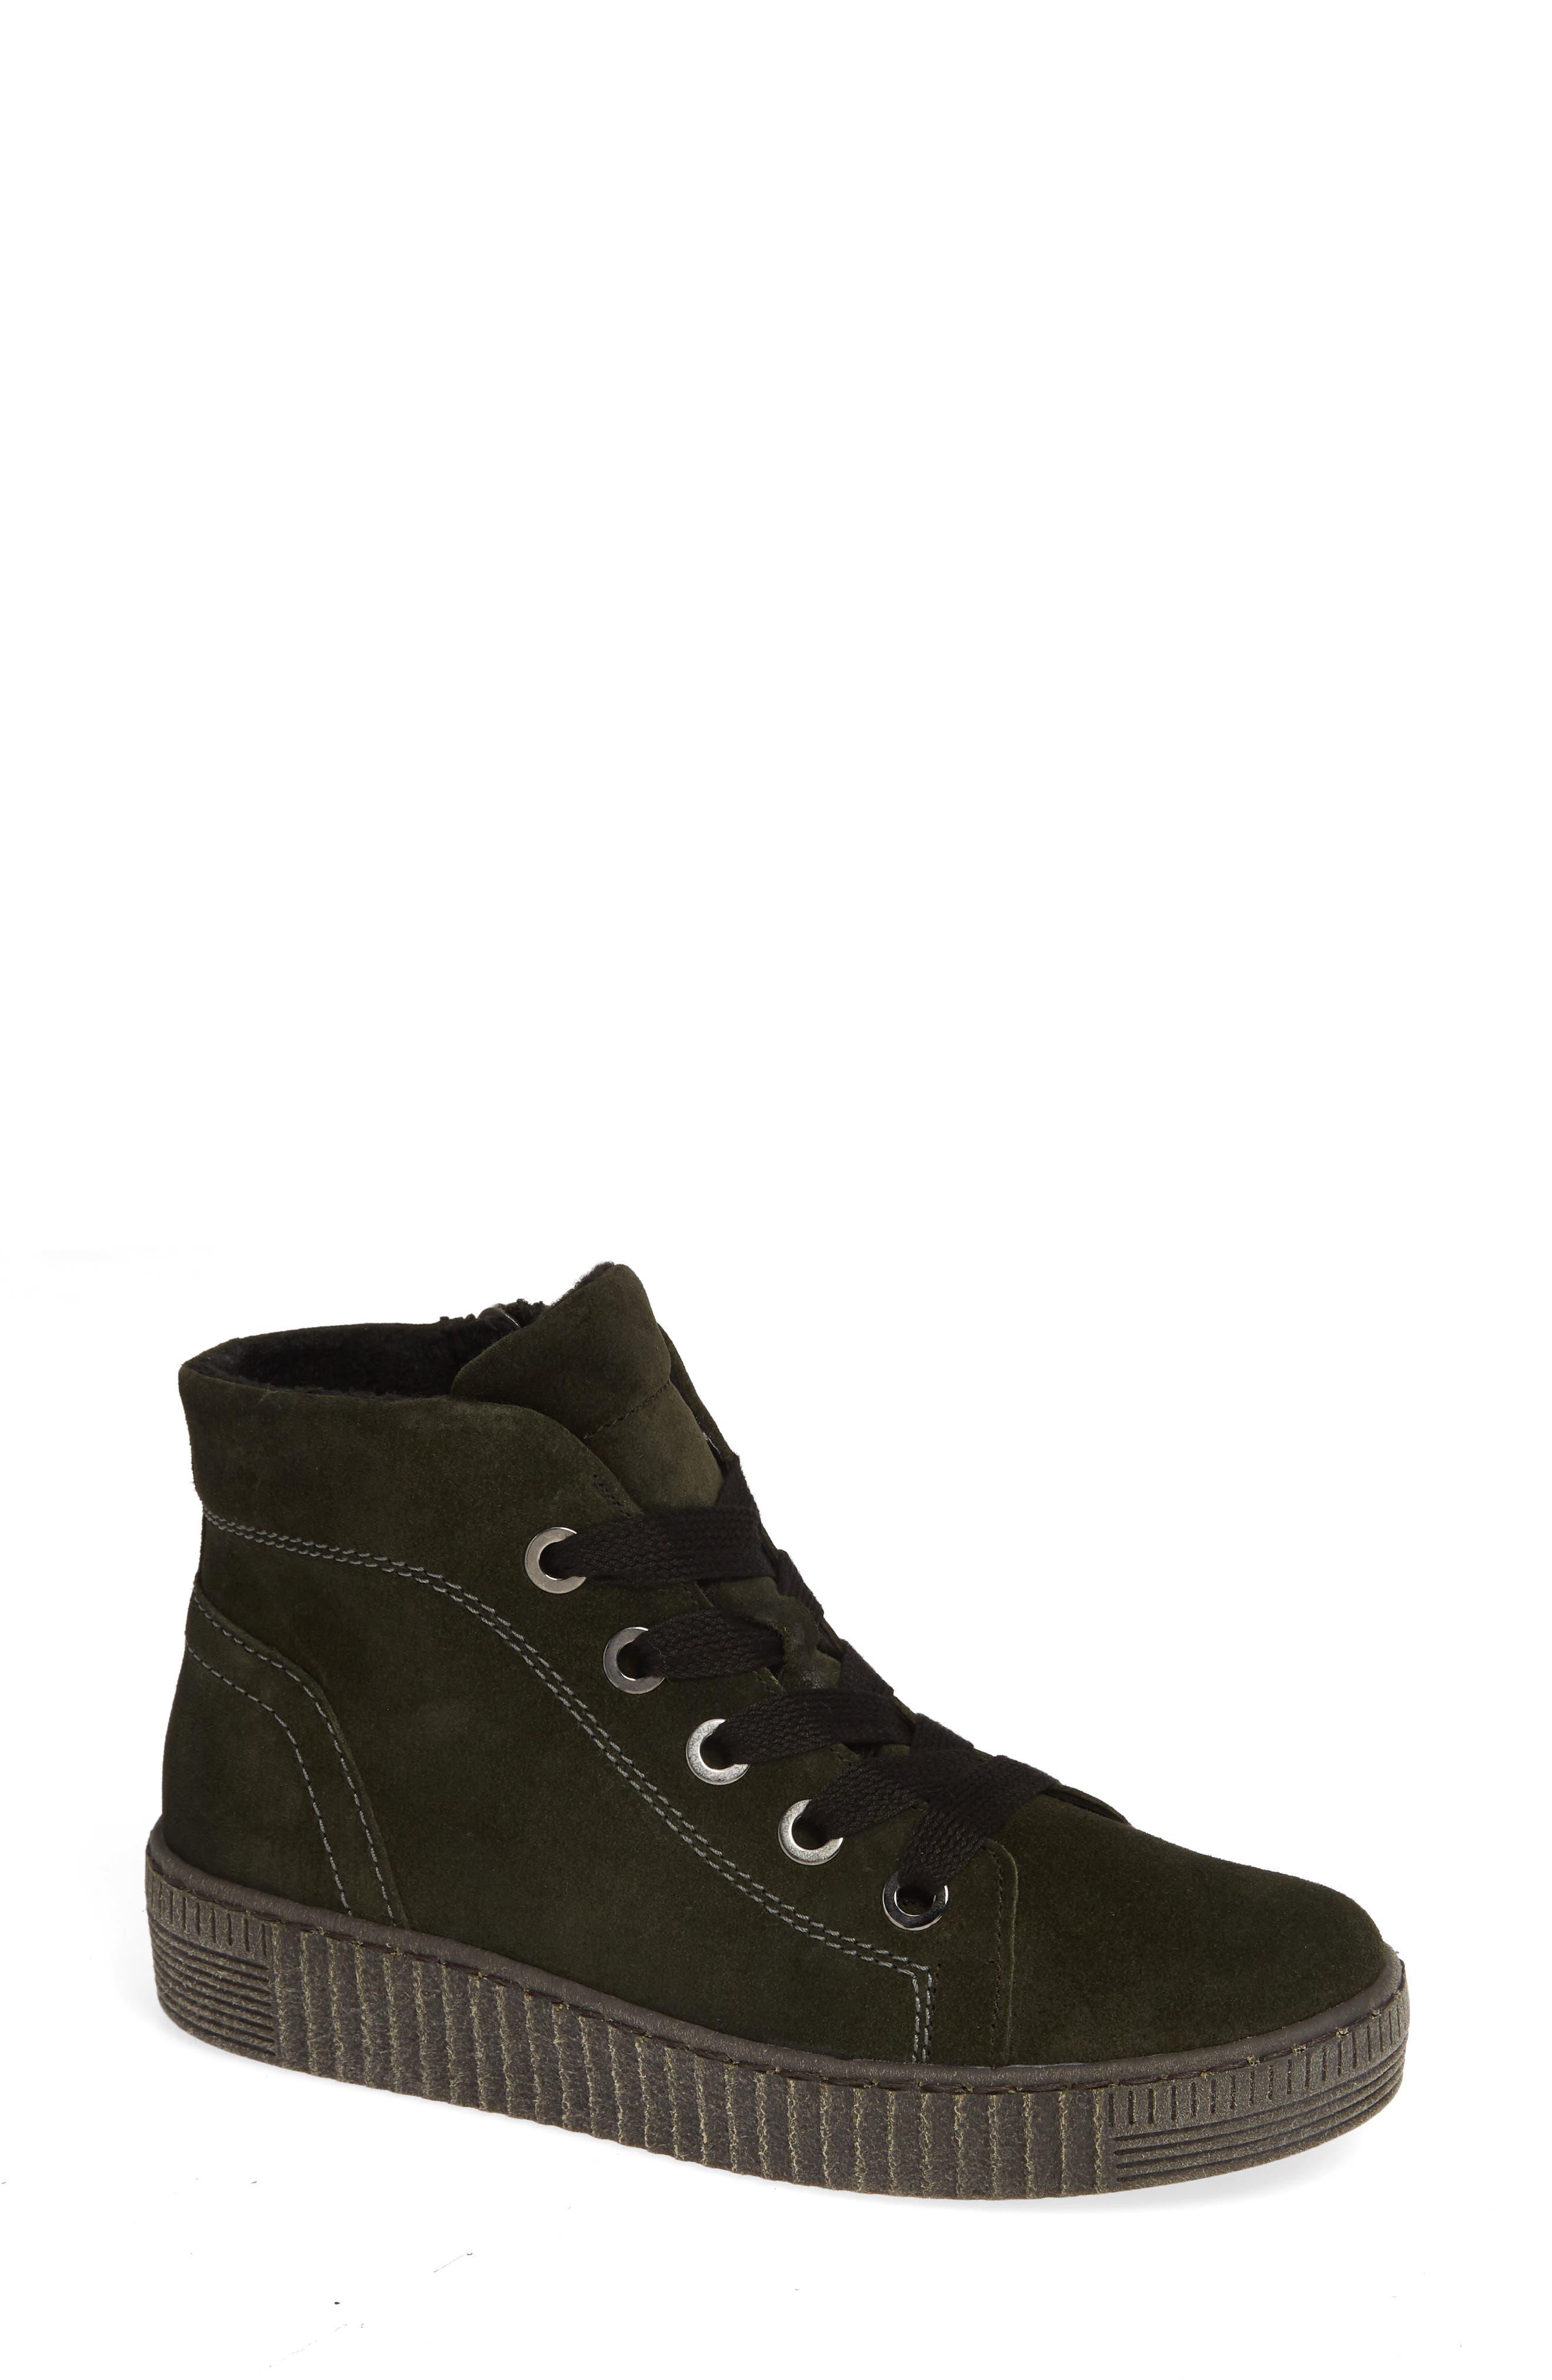 Gabor High Top Sneaker- Green